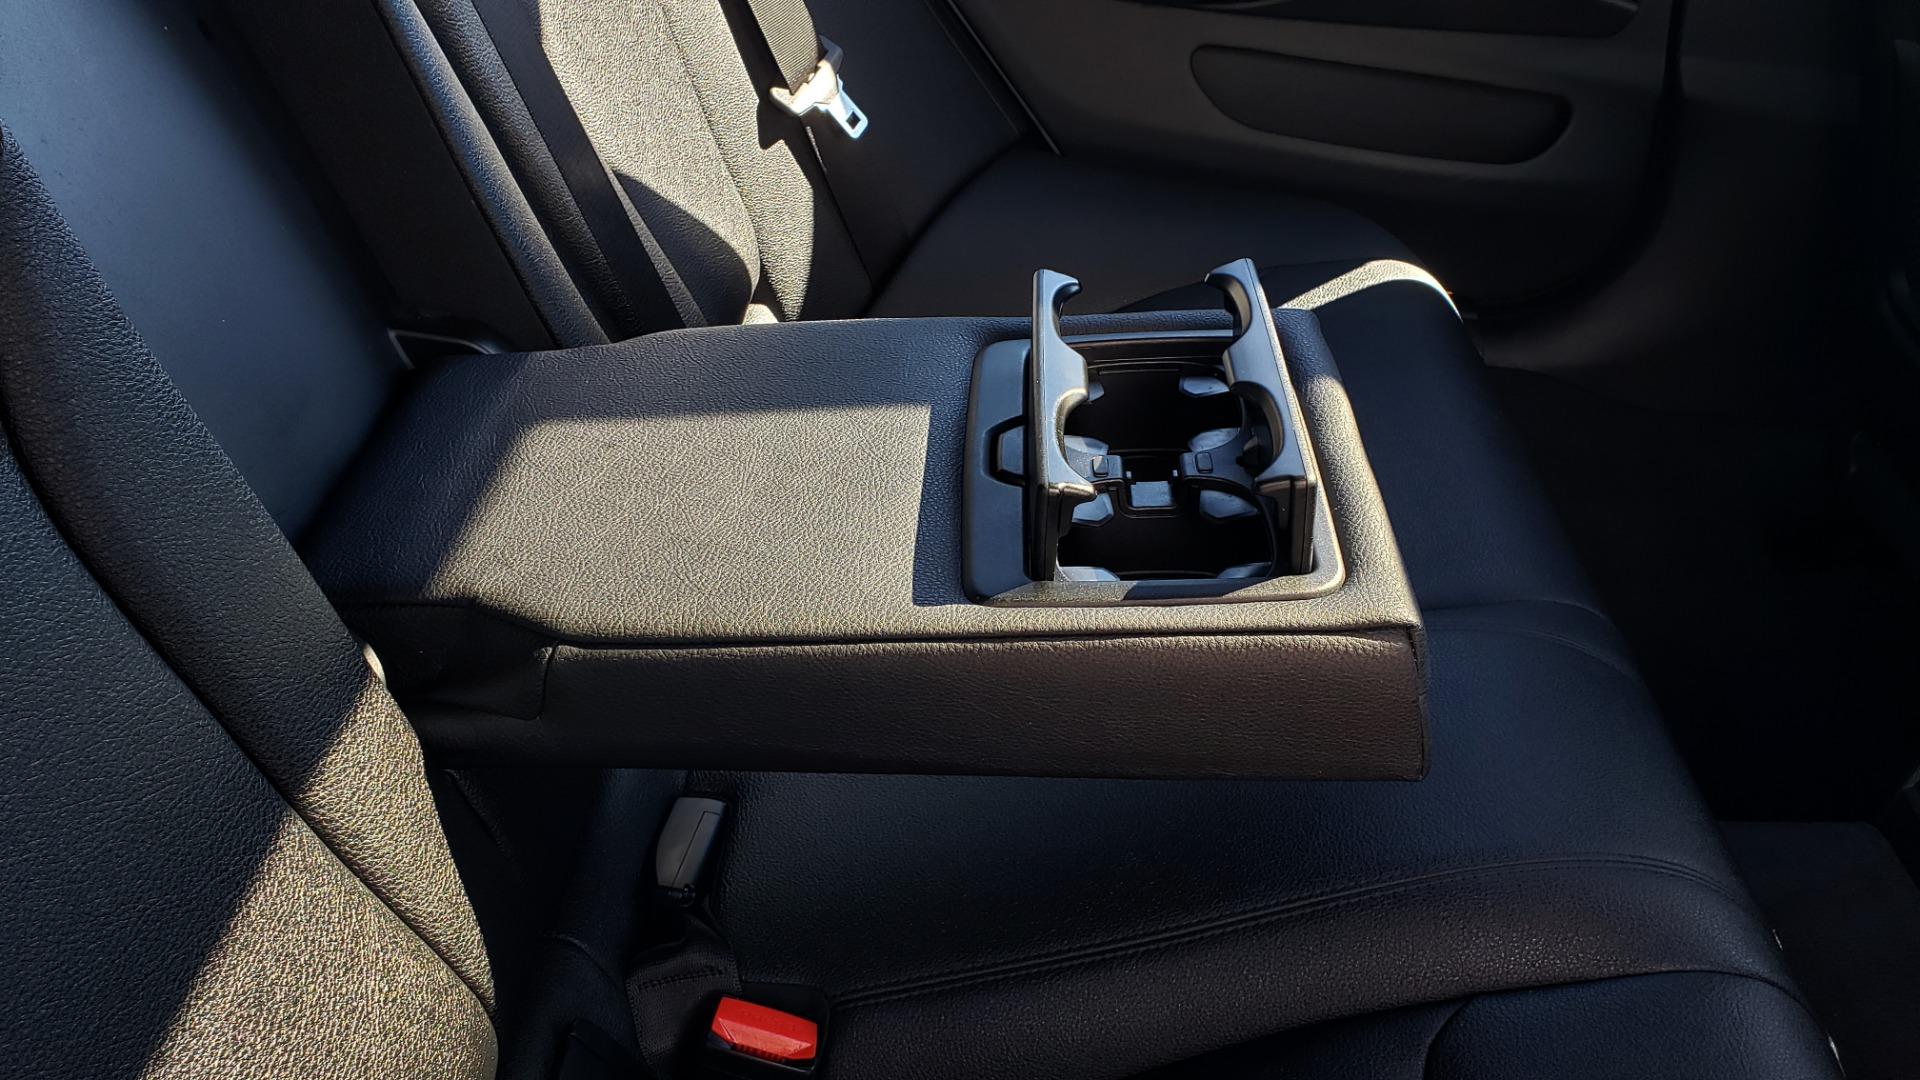 Used 2018 BMW 4 SERIES 430IXDRIVE / PREMIUM / NAV / SUNROOF / ESSENTIALS PKG for sale $28,995 at Formula Imports in Charlotte NC 28227 77